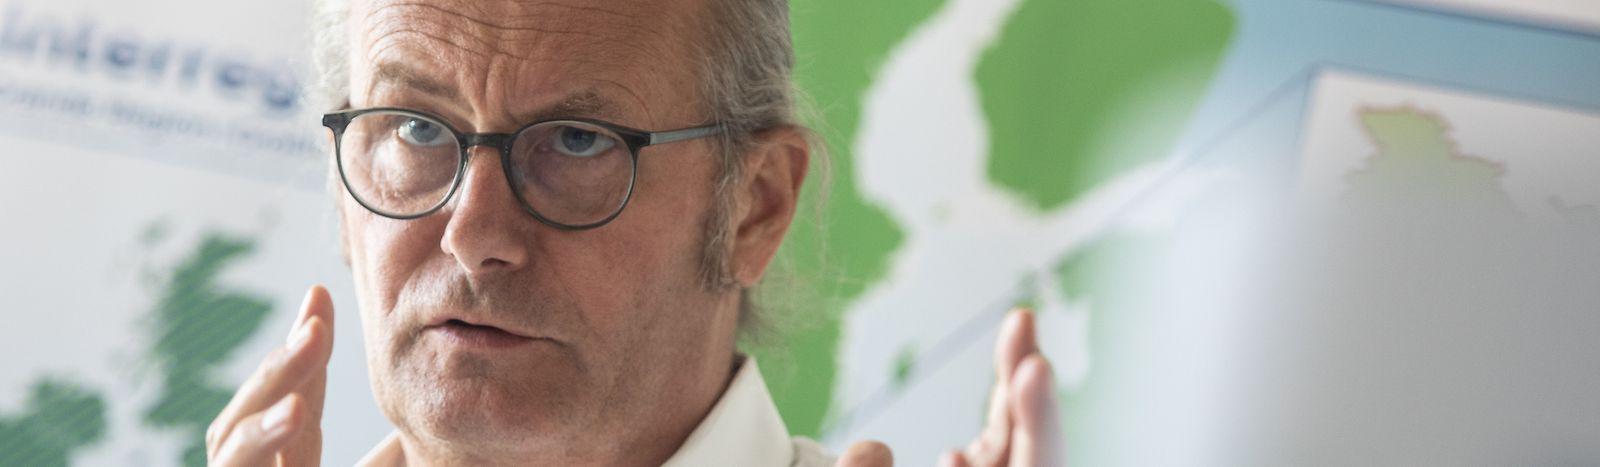 IPO.30 Jahre Interreg-ITV mit Claude Turmes. Foto: Gerry Huberty/Luxemburger Wort